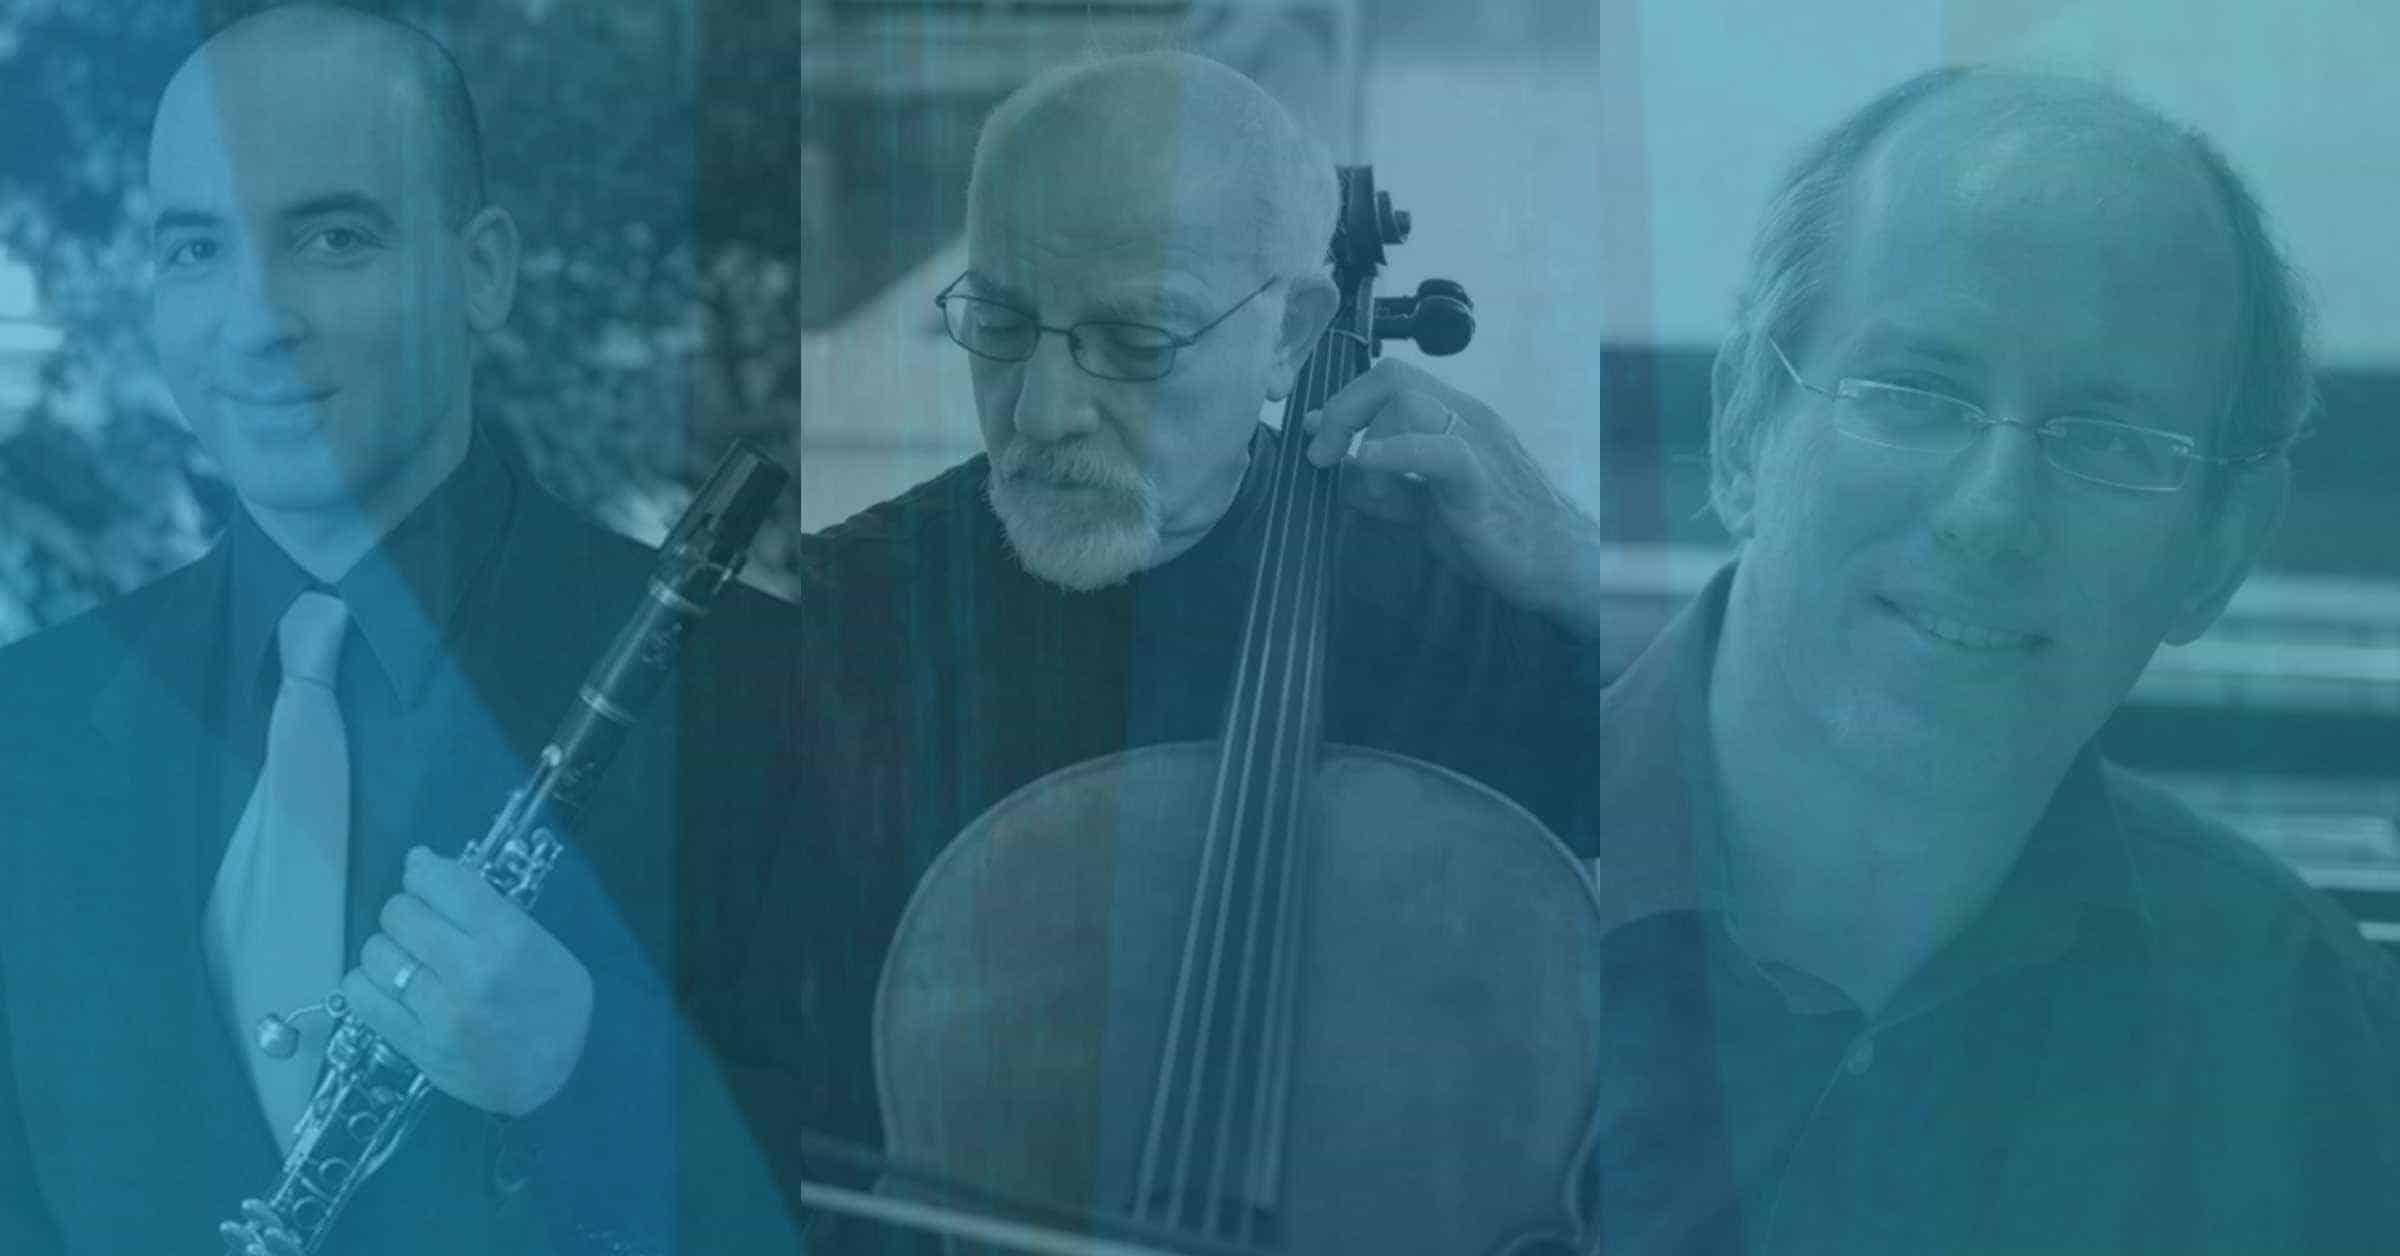 Amitai Vardi, Uri Vardi, Arnon Erez